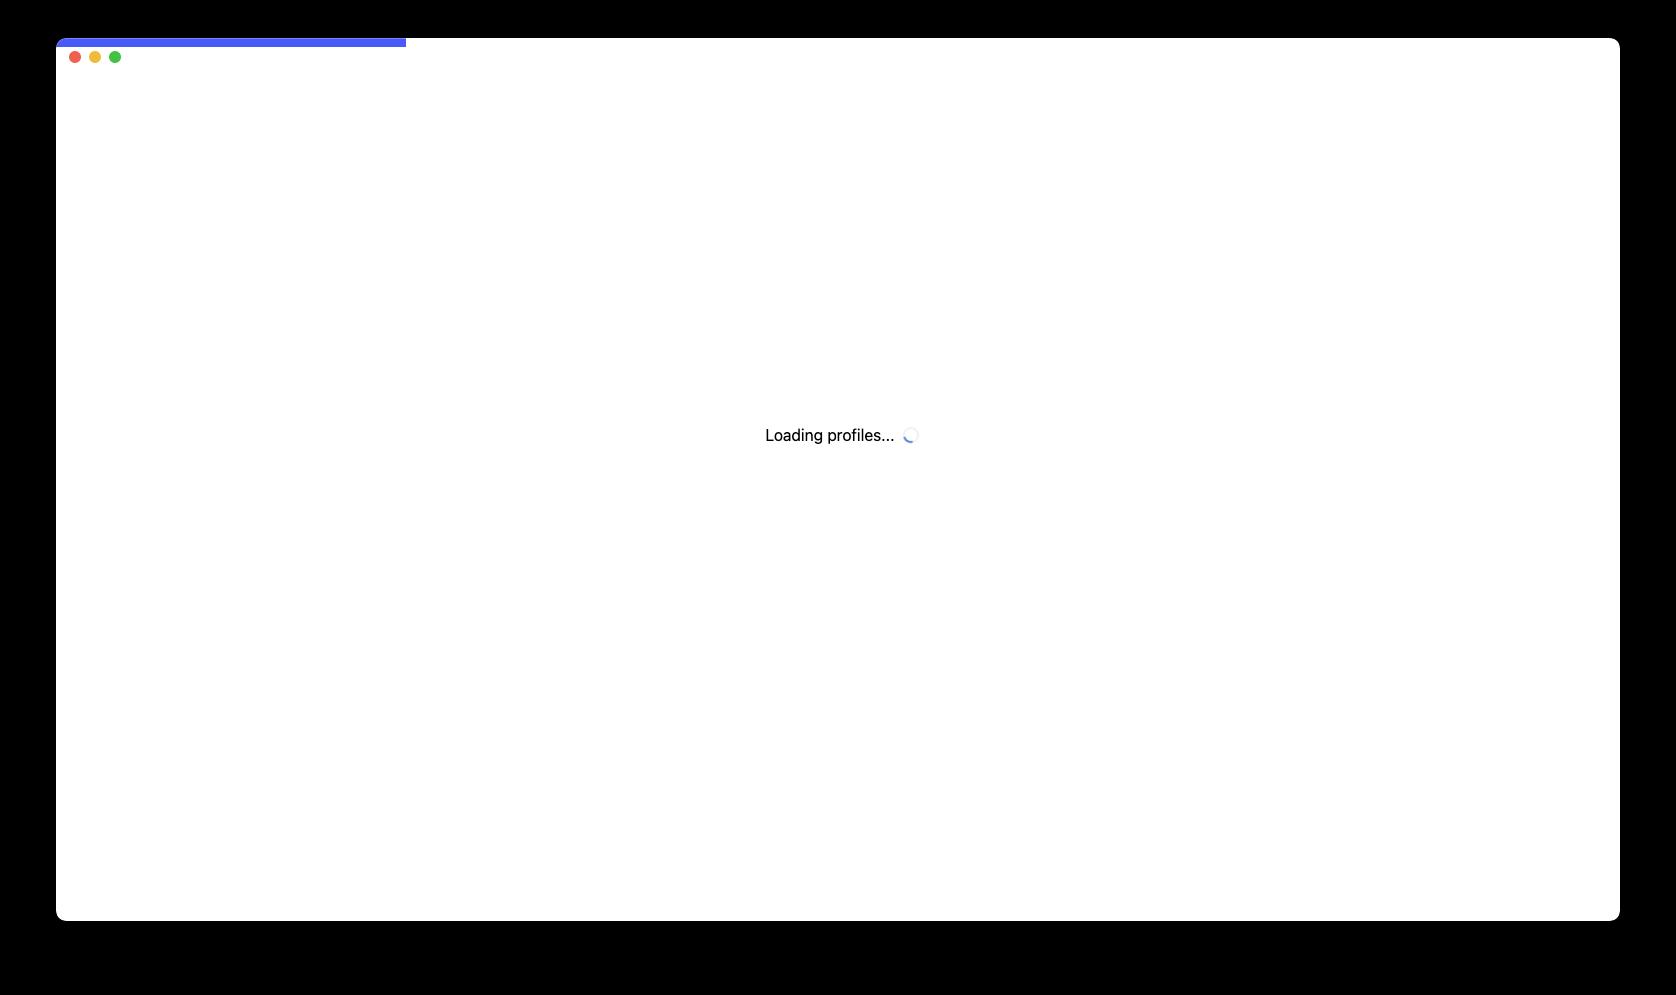 Dynobase profiles loading screen